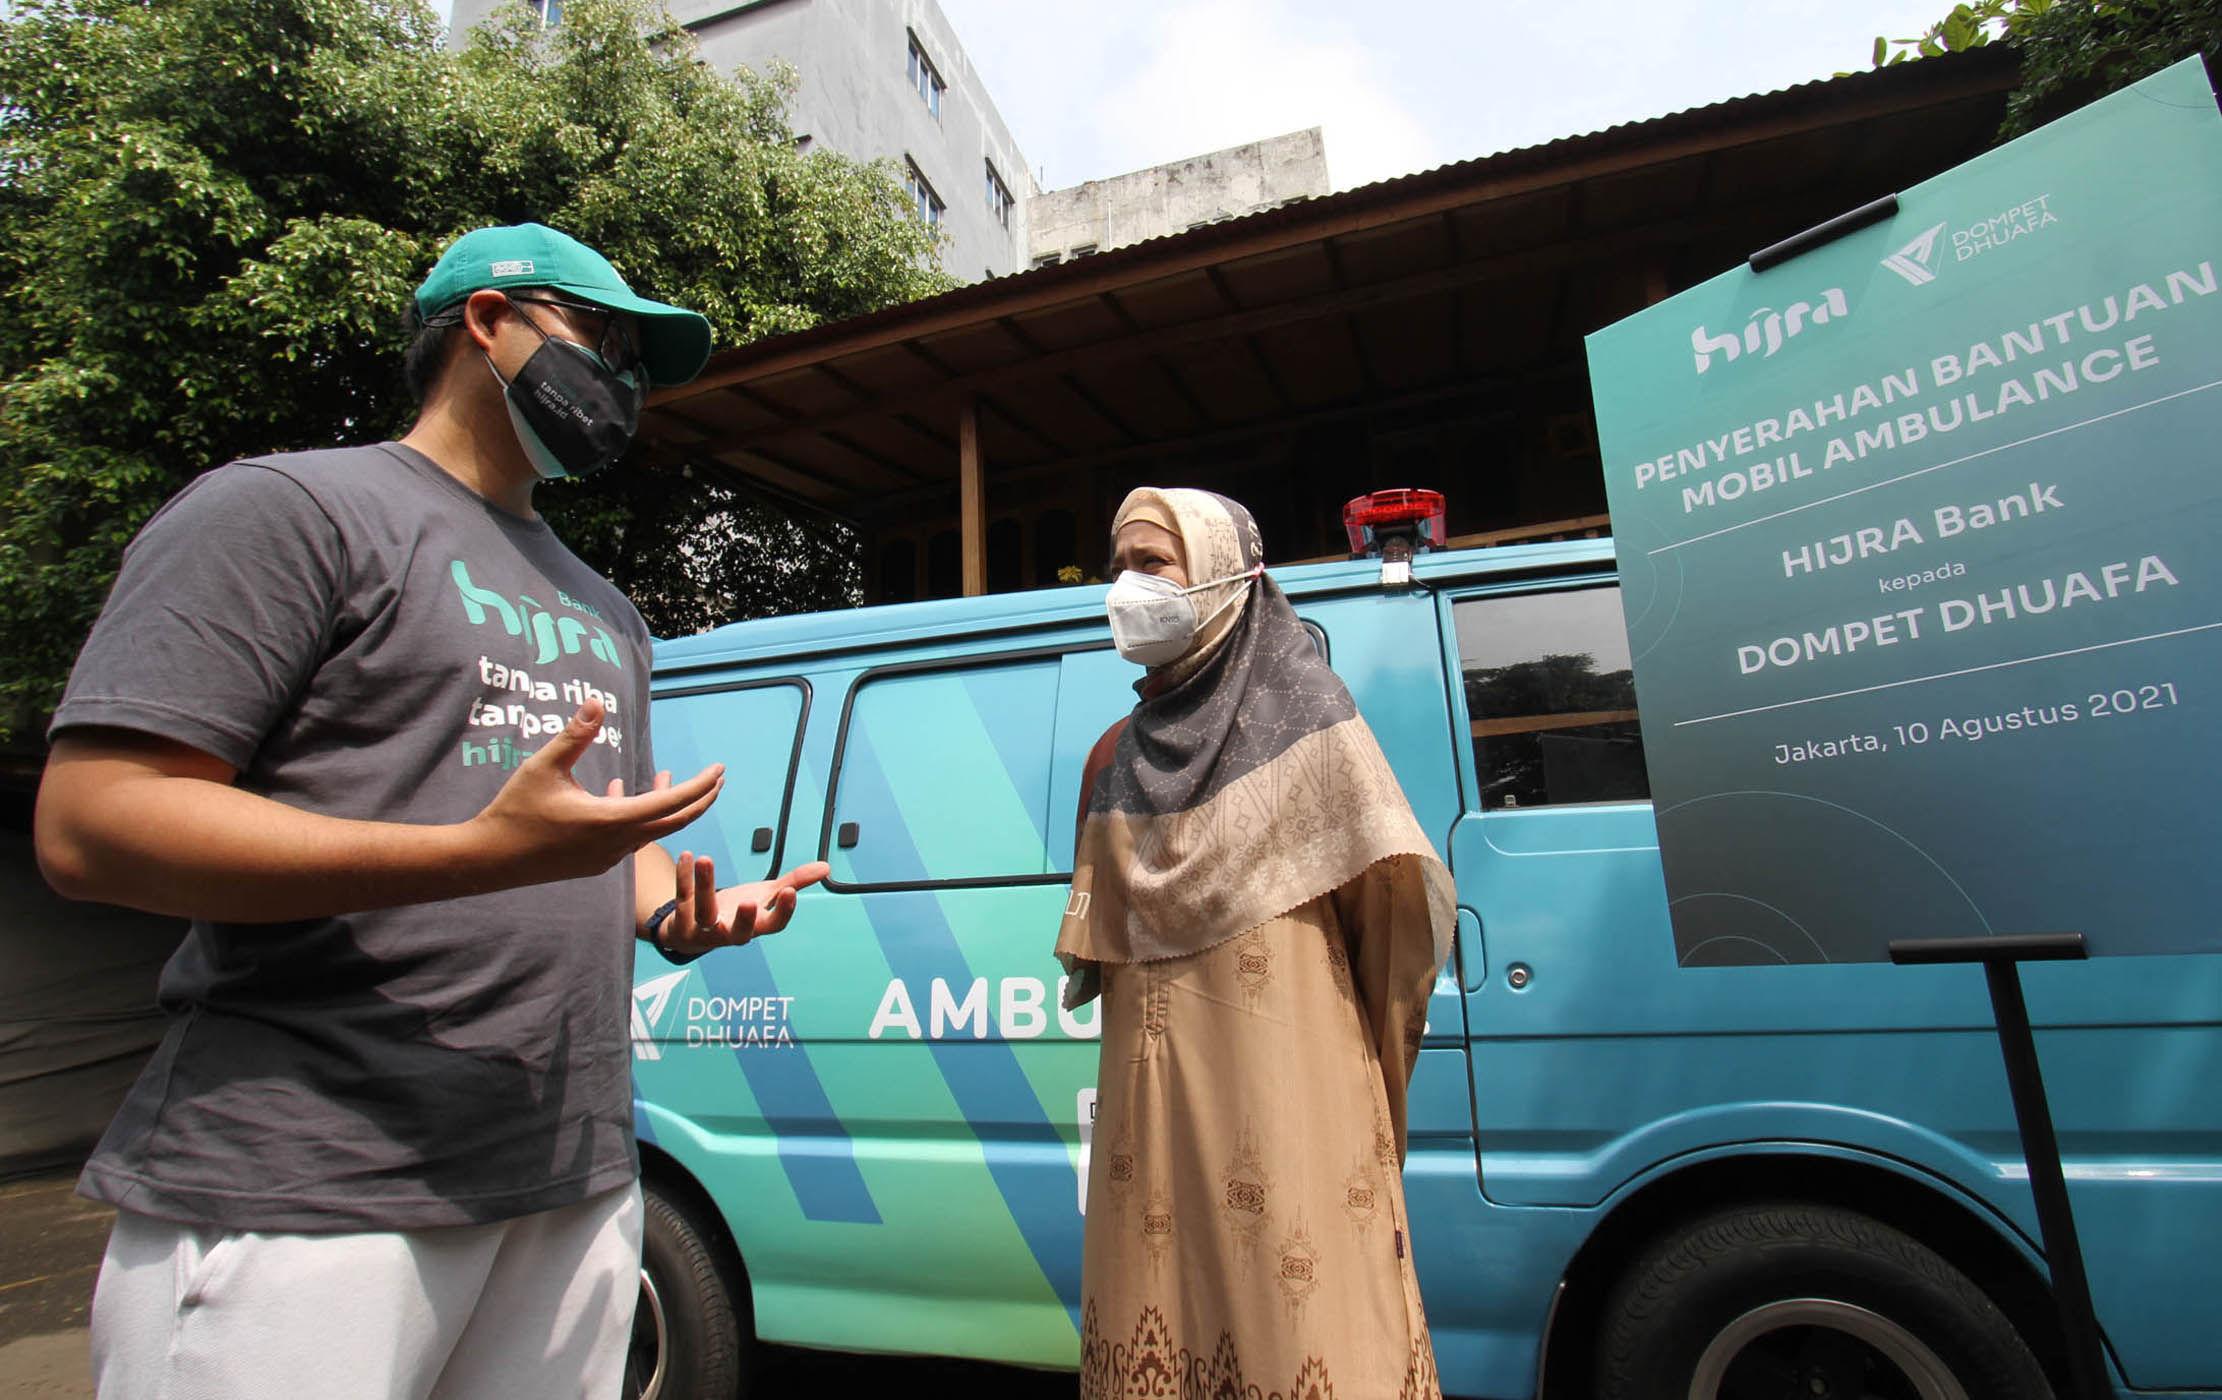 Donasi Ambulans Untuk Dompet Dhuafa